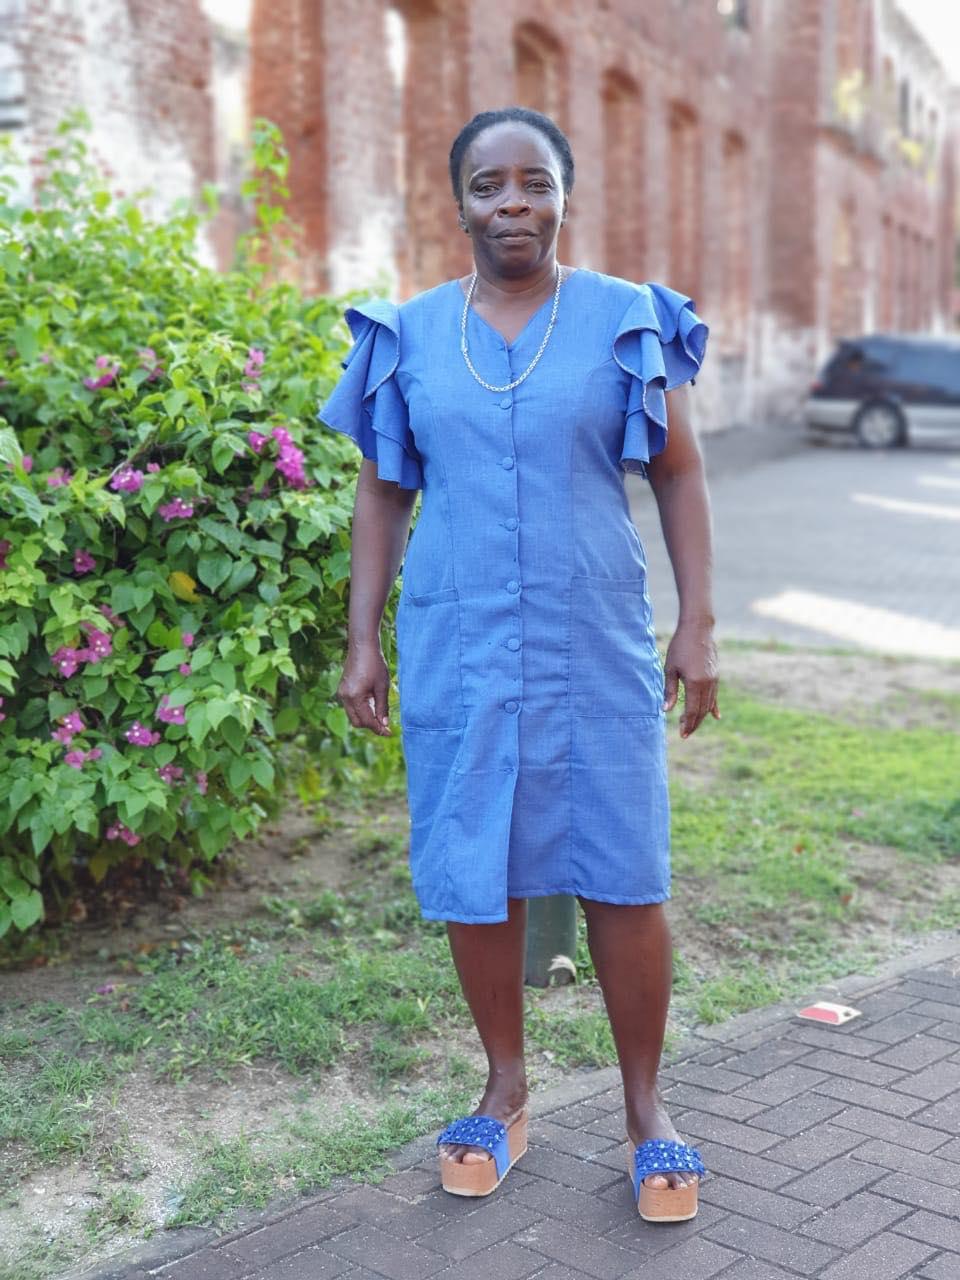 eudia Moezel Suriname Paramaribo 12